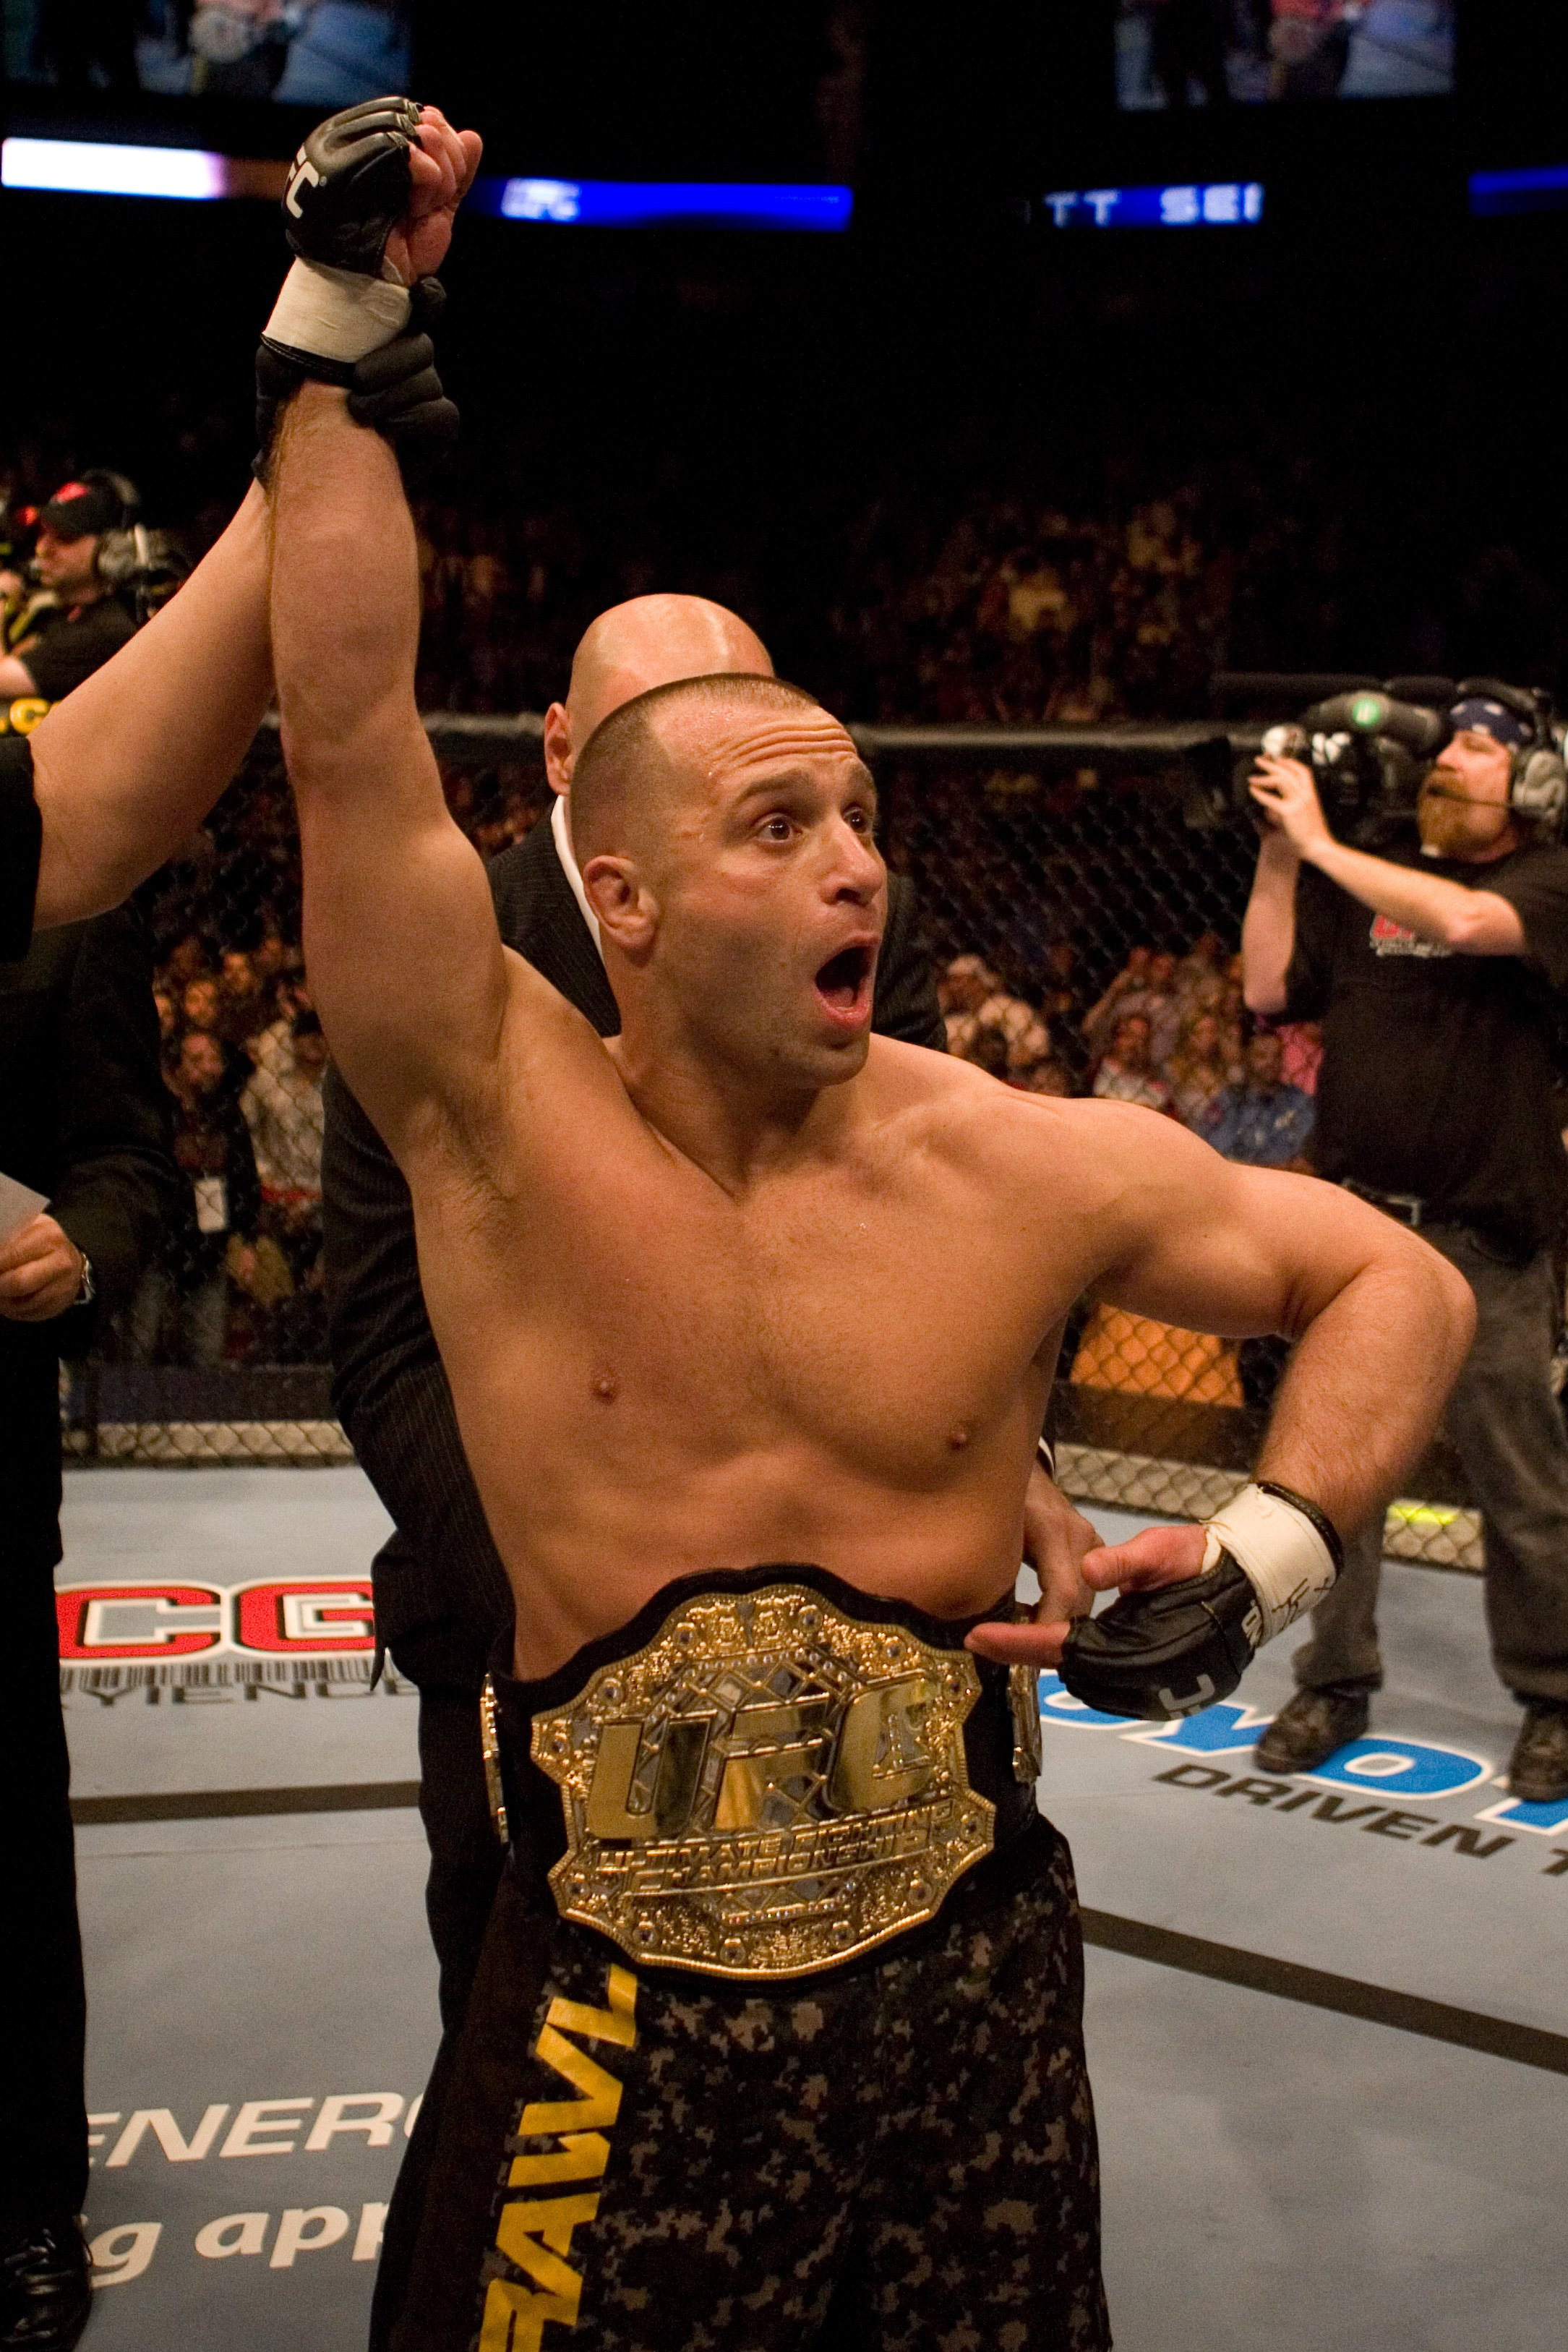 HOUSTON - APRIL 7: Matt Serra (brown/camo shorts) def. Georges St-Pierre (green shorts) - TKO - 3:25 round 1 during UFC 69 at Toyota Center on April 7, 2007 in Houston, Texas. (Photo by Josh Hedges/Zuffa LLC)